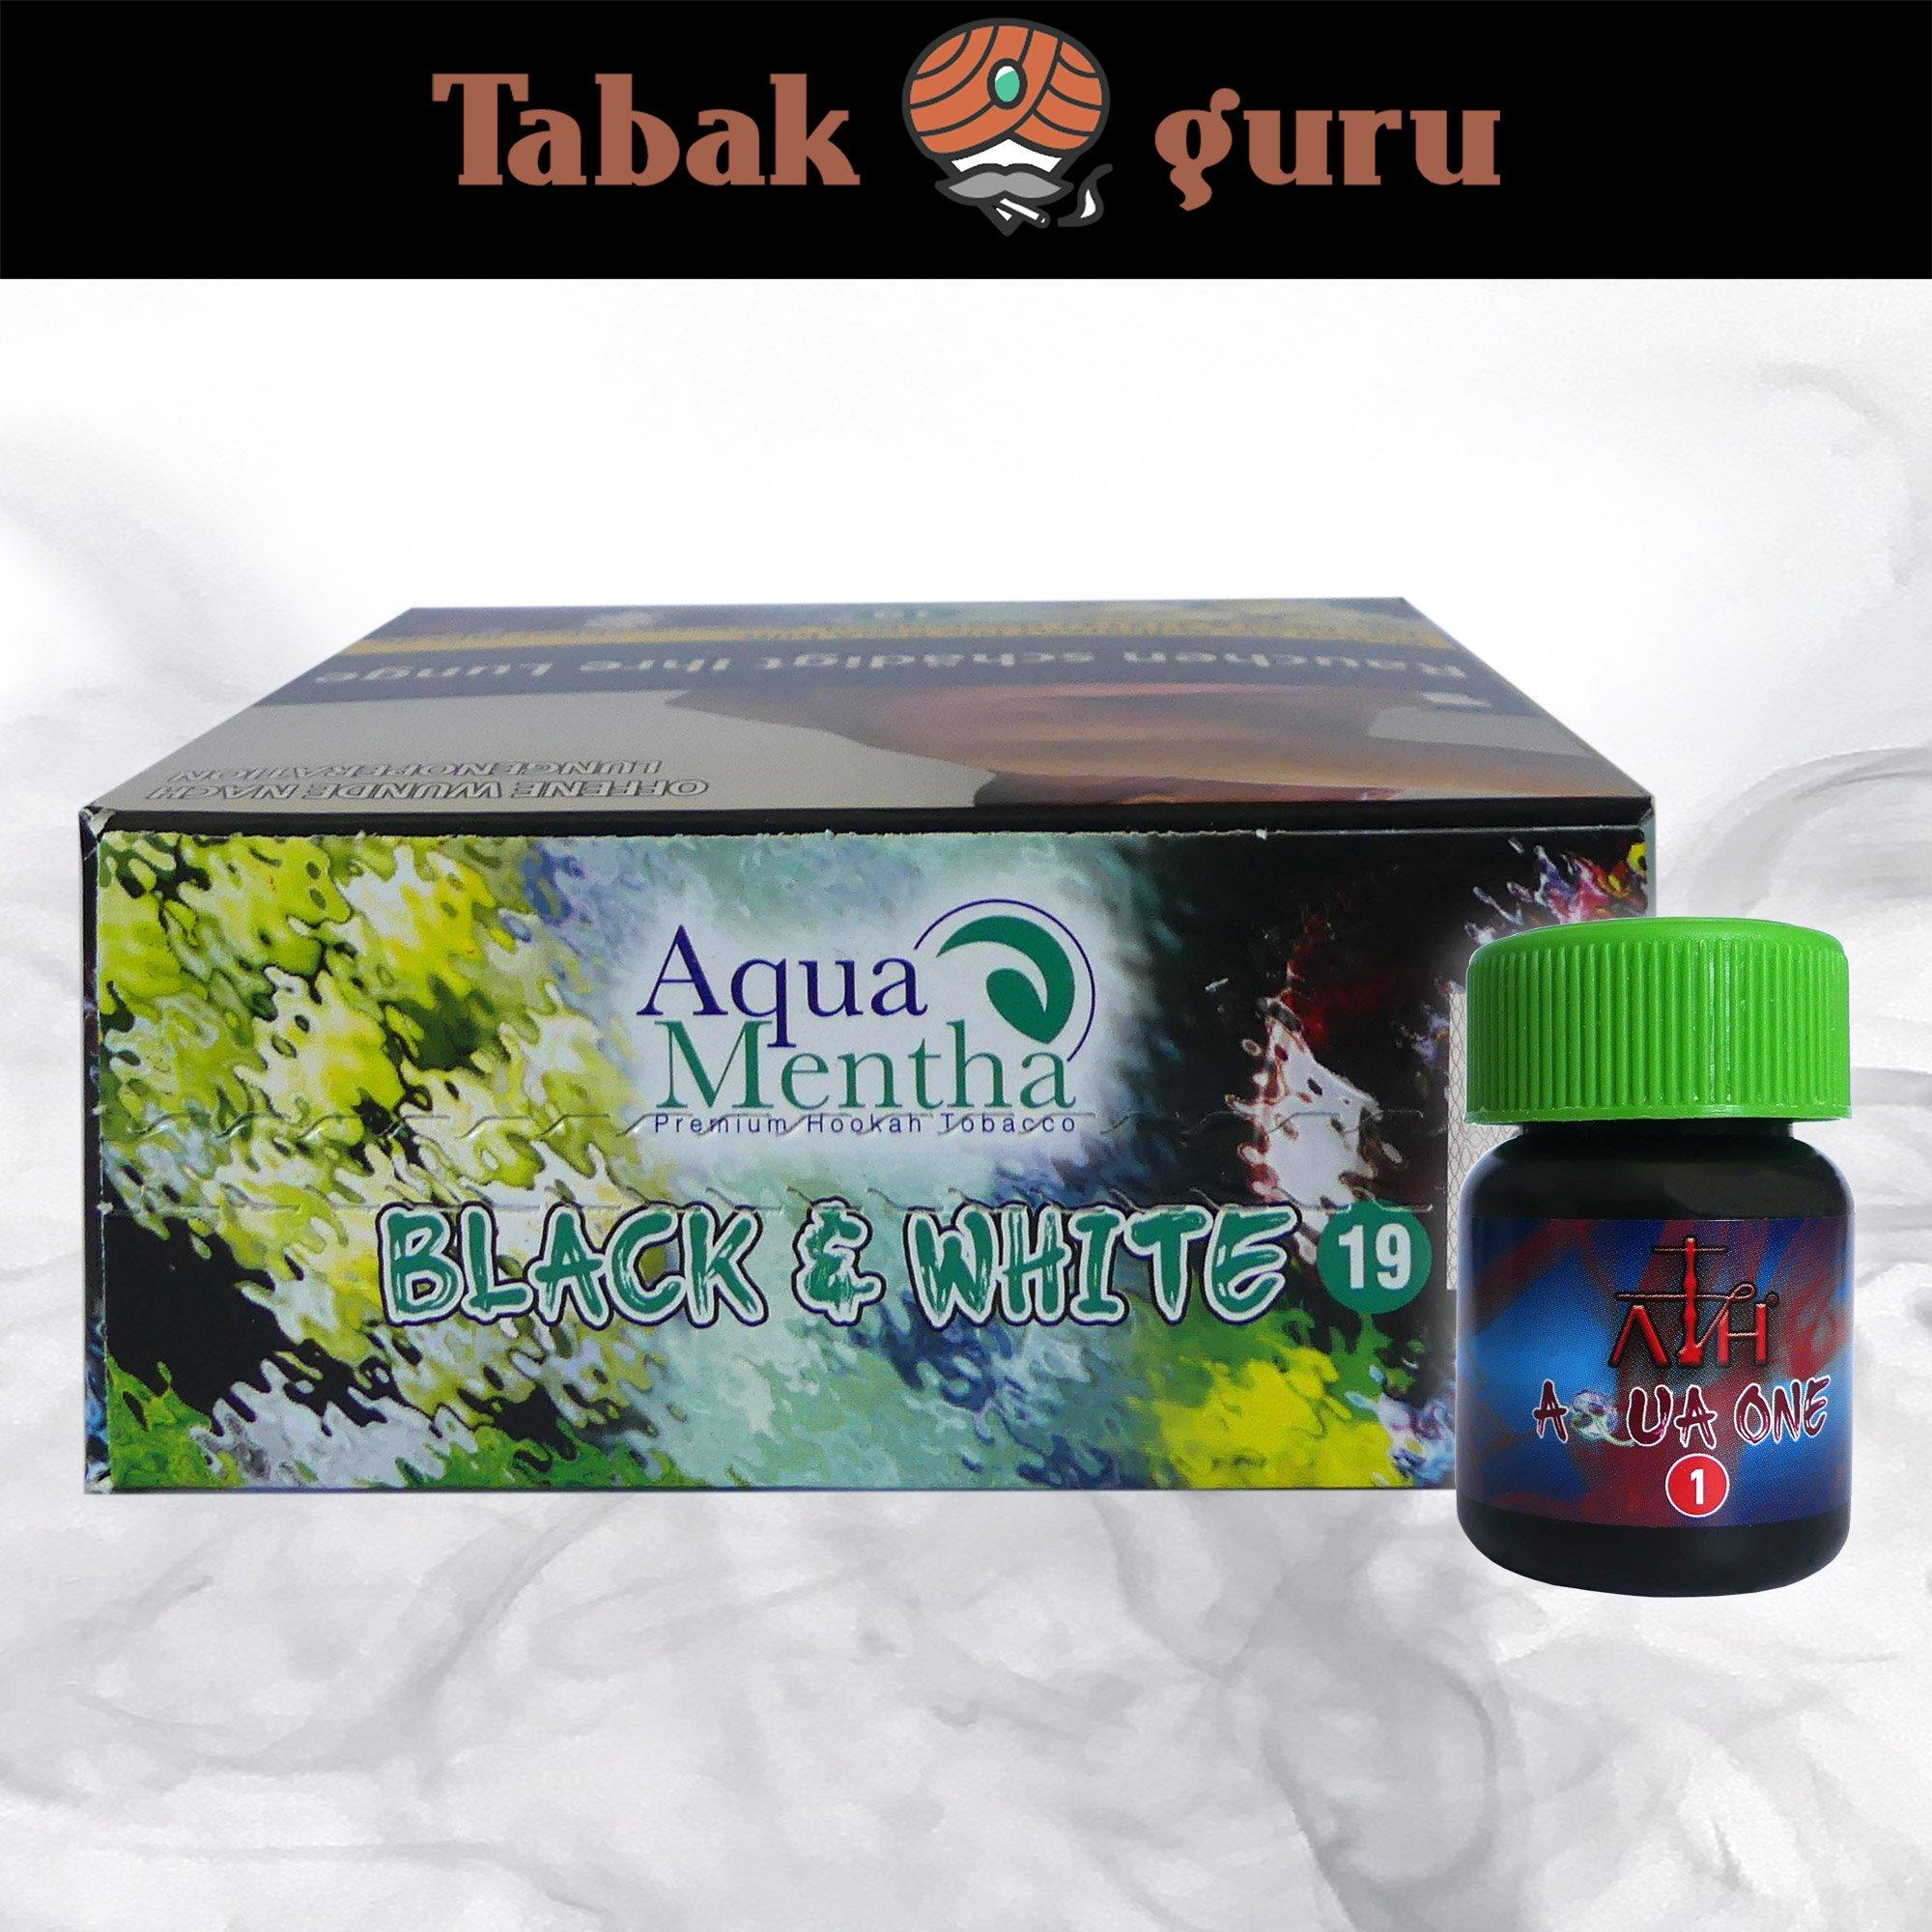 Aqua Mentha BLACK & WHITE #19 200g Shisha Tabak + ATH Aqua One Mix